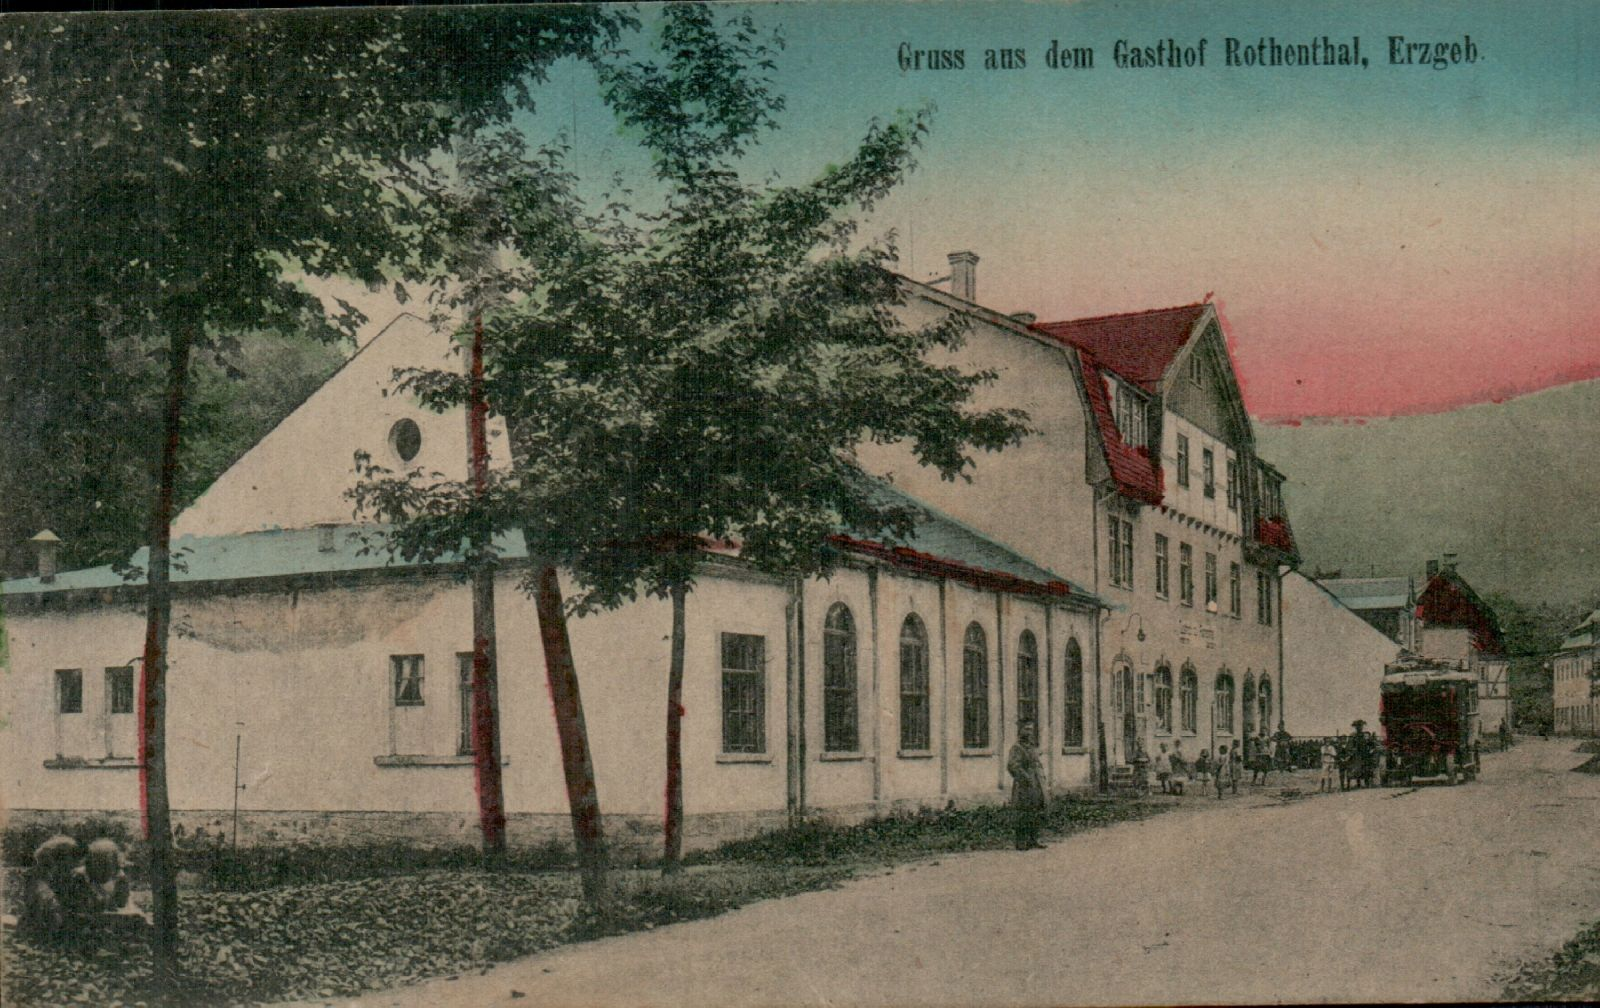 Gasthof Rothenthal